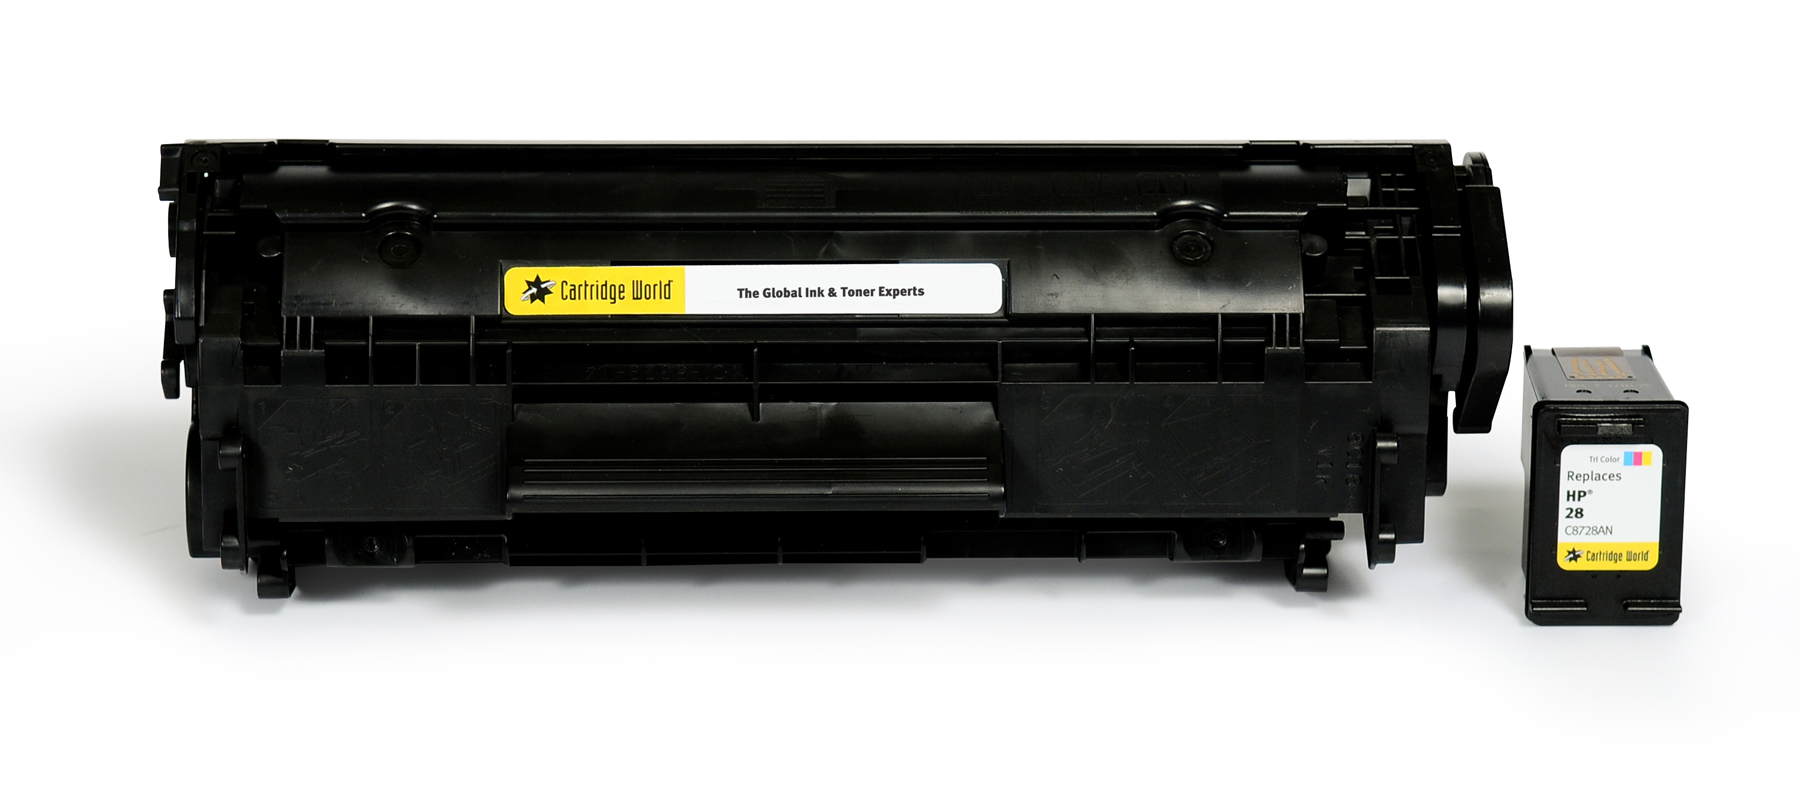 cartridge world printer cartridge - Toner Cartridge Refill